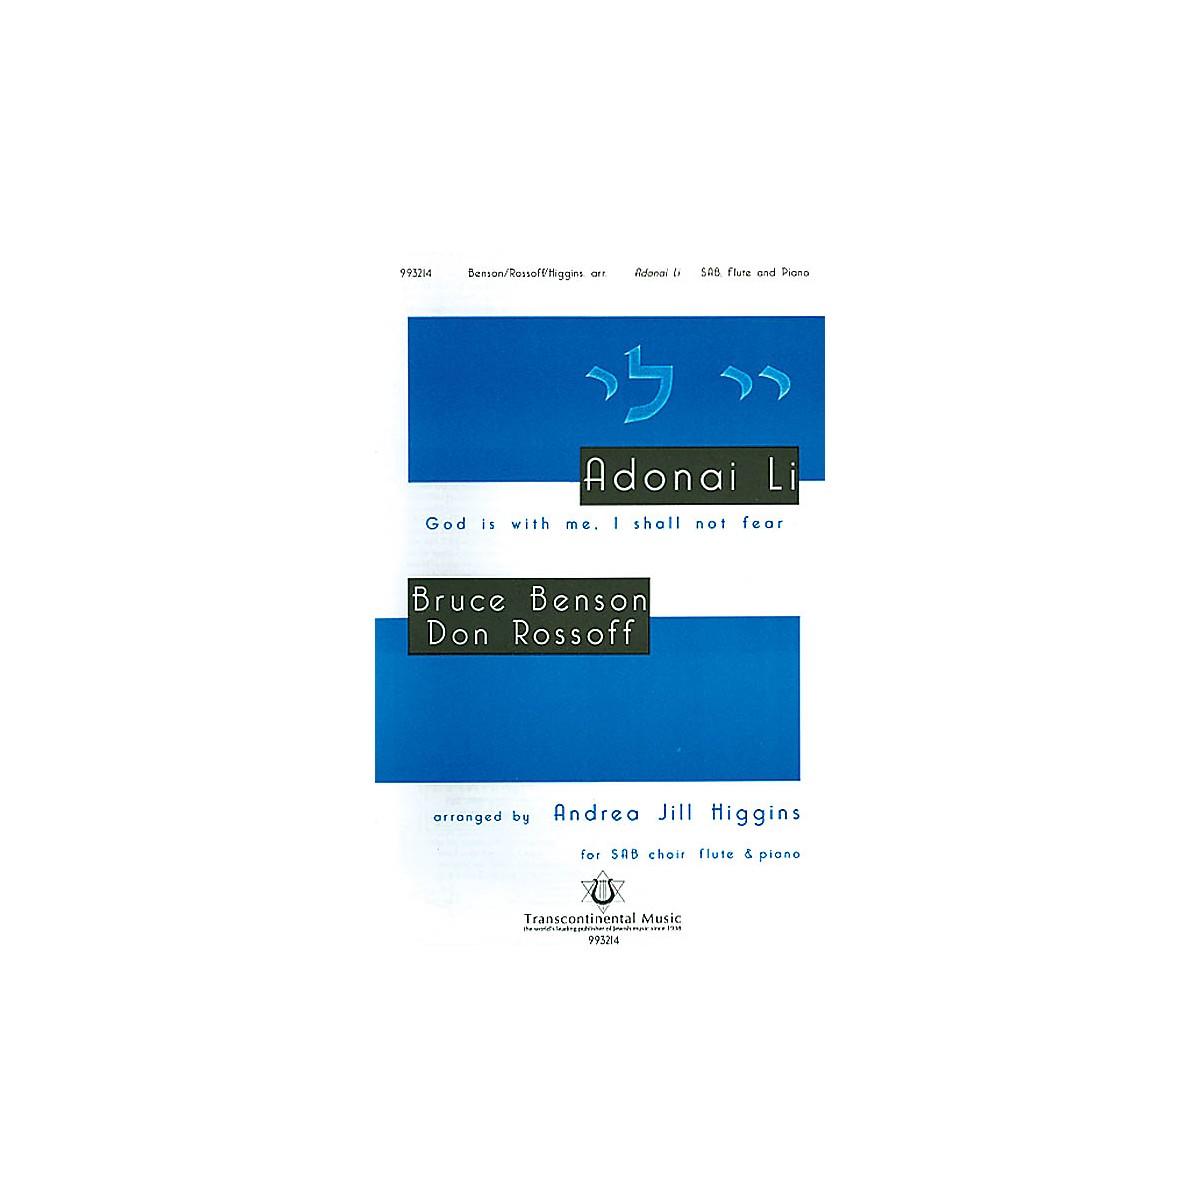 Transcontinental Music Adonai Li (God Is With Me, I Shall Not Fear) SAB arranged by Andrea Jill Higgins